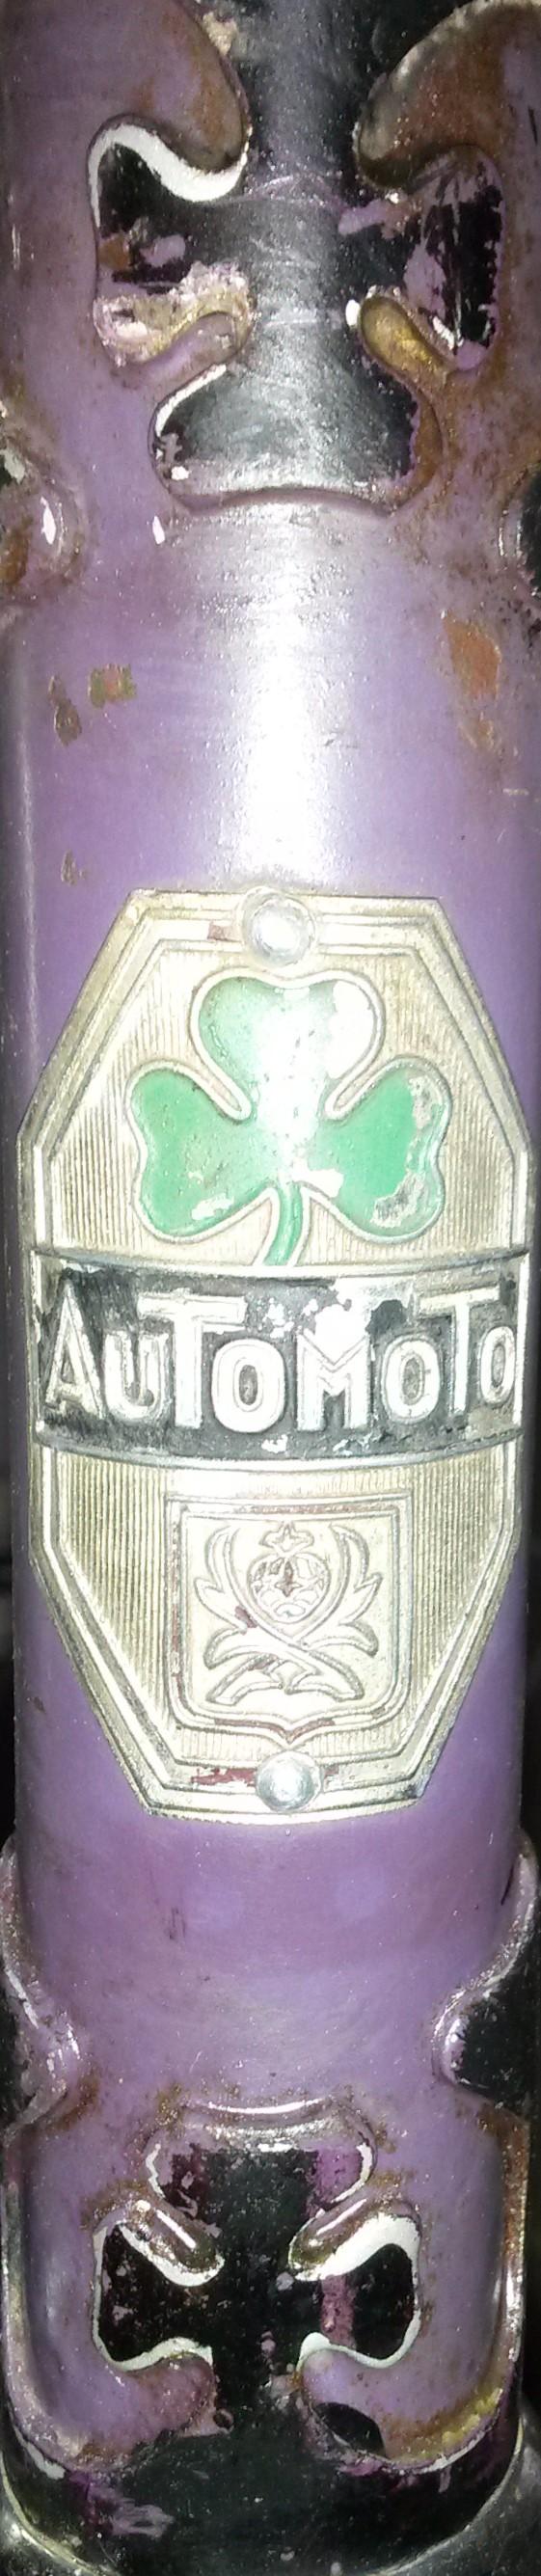 AUTOMOTO 1942 20191161